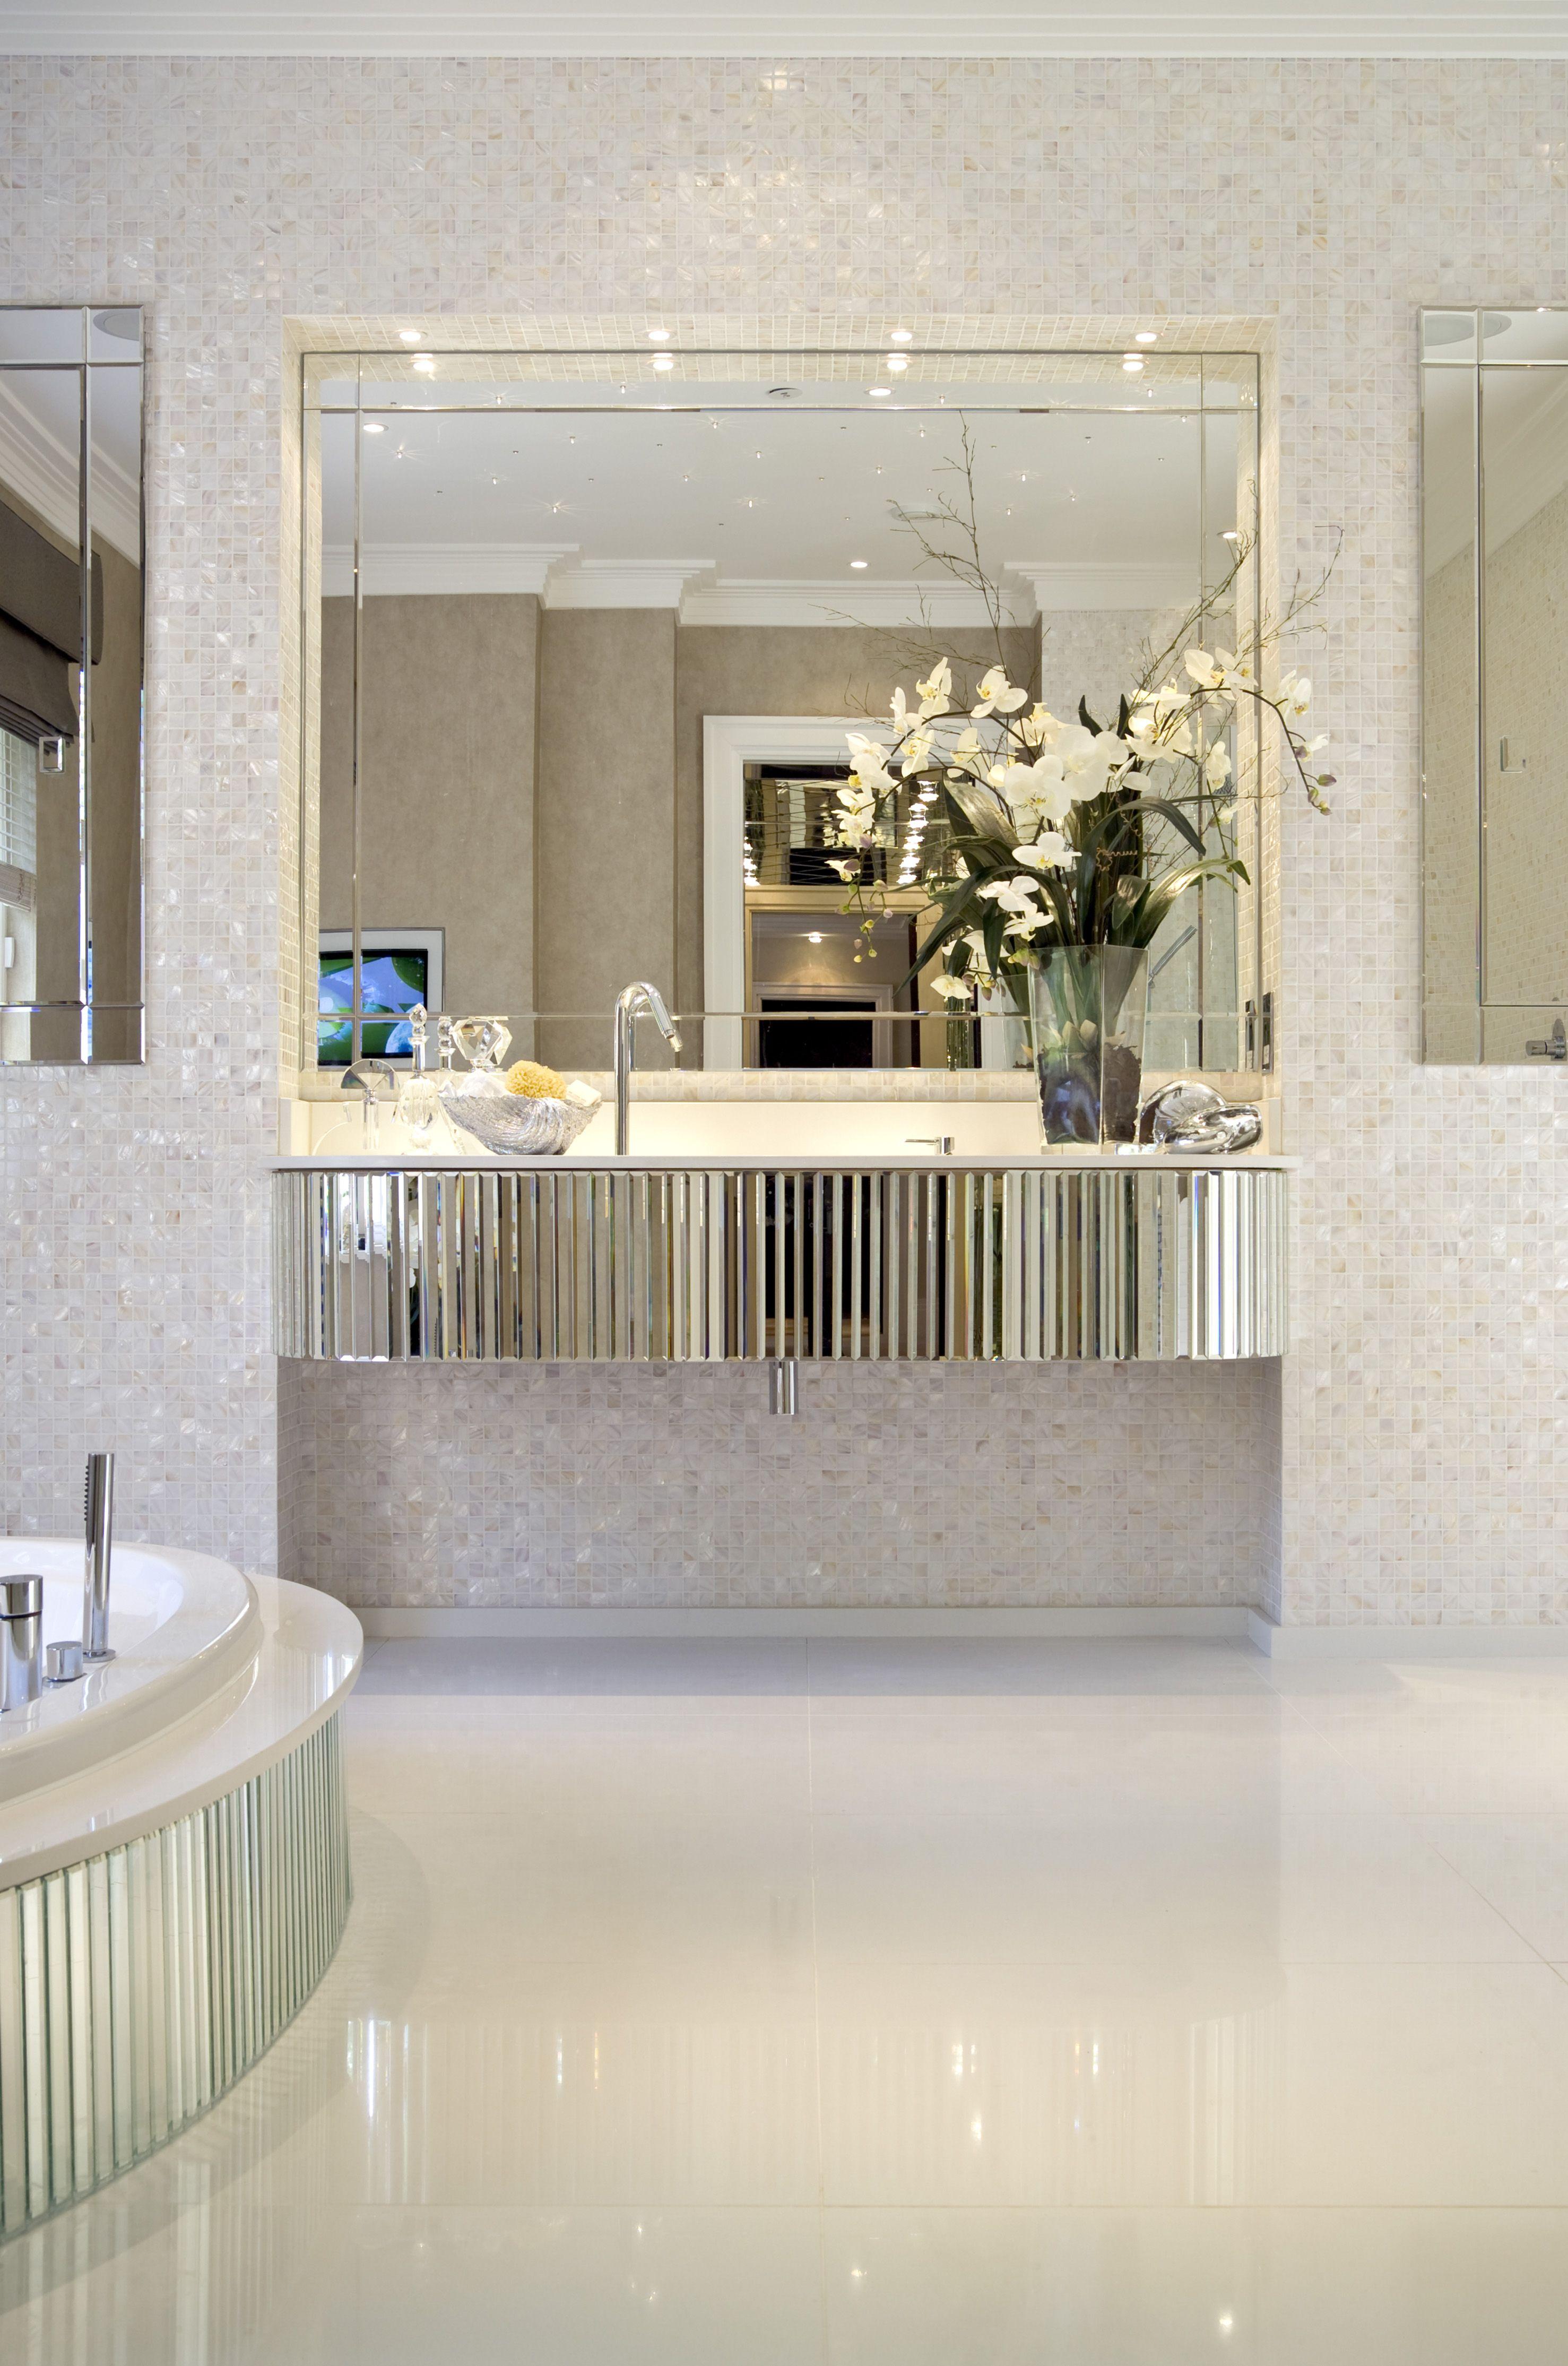 bevelled mirror floating vanity unit and semisunken bath create art deco glamour in master